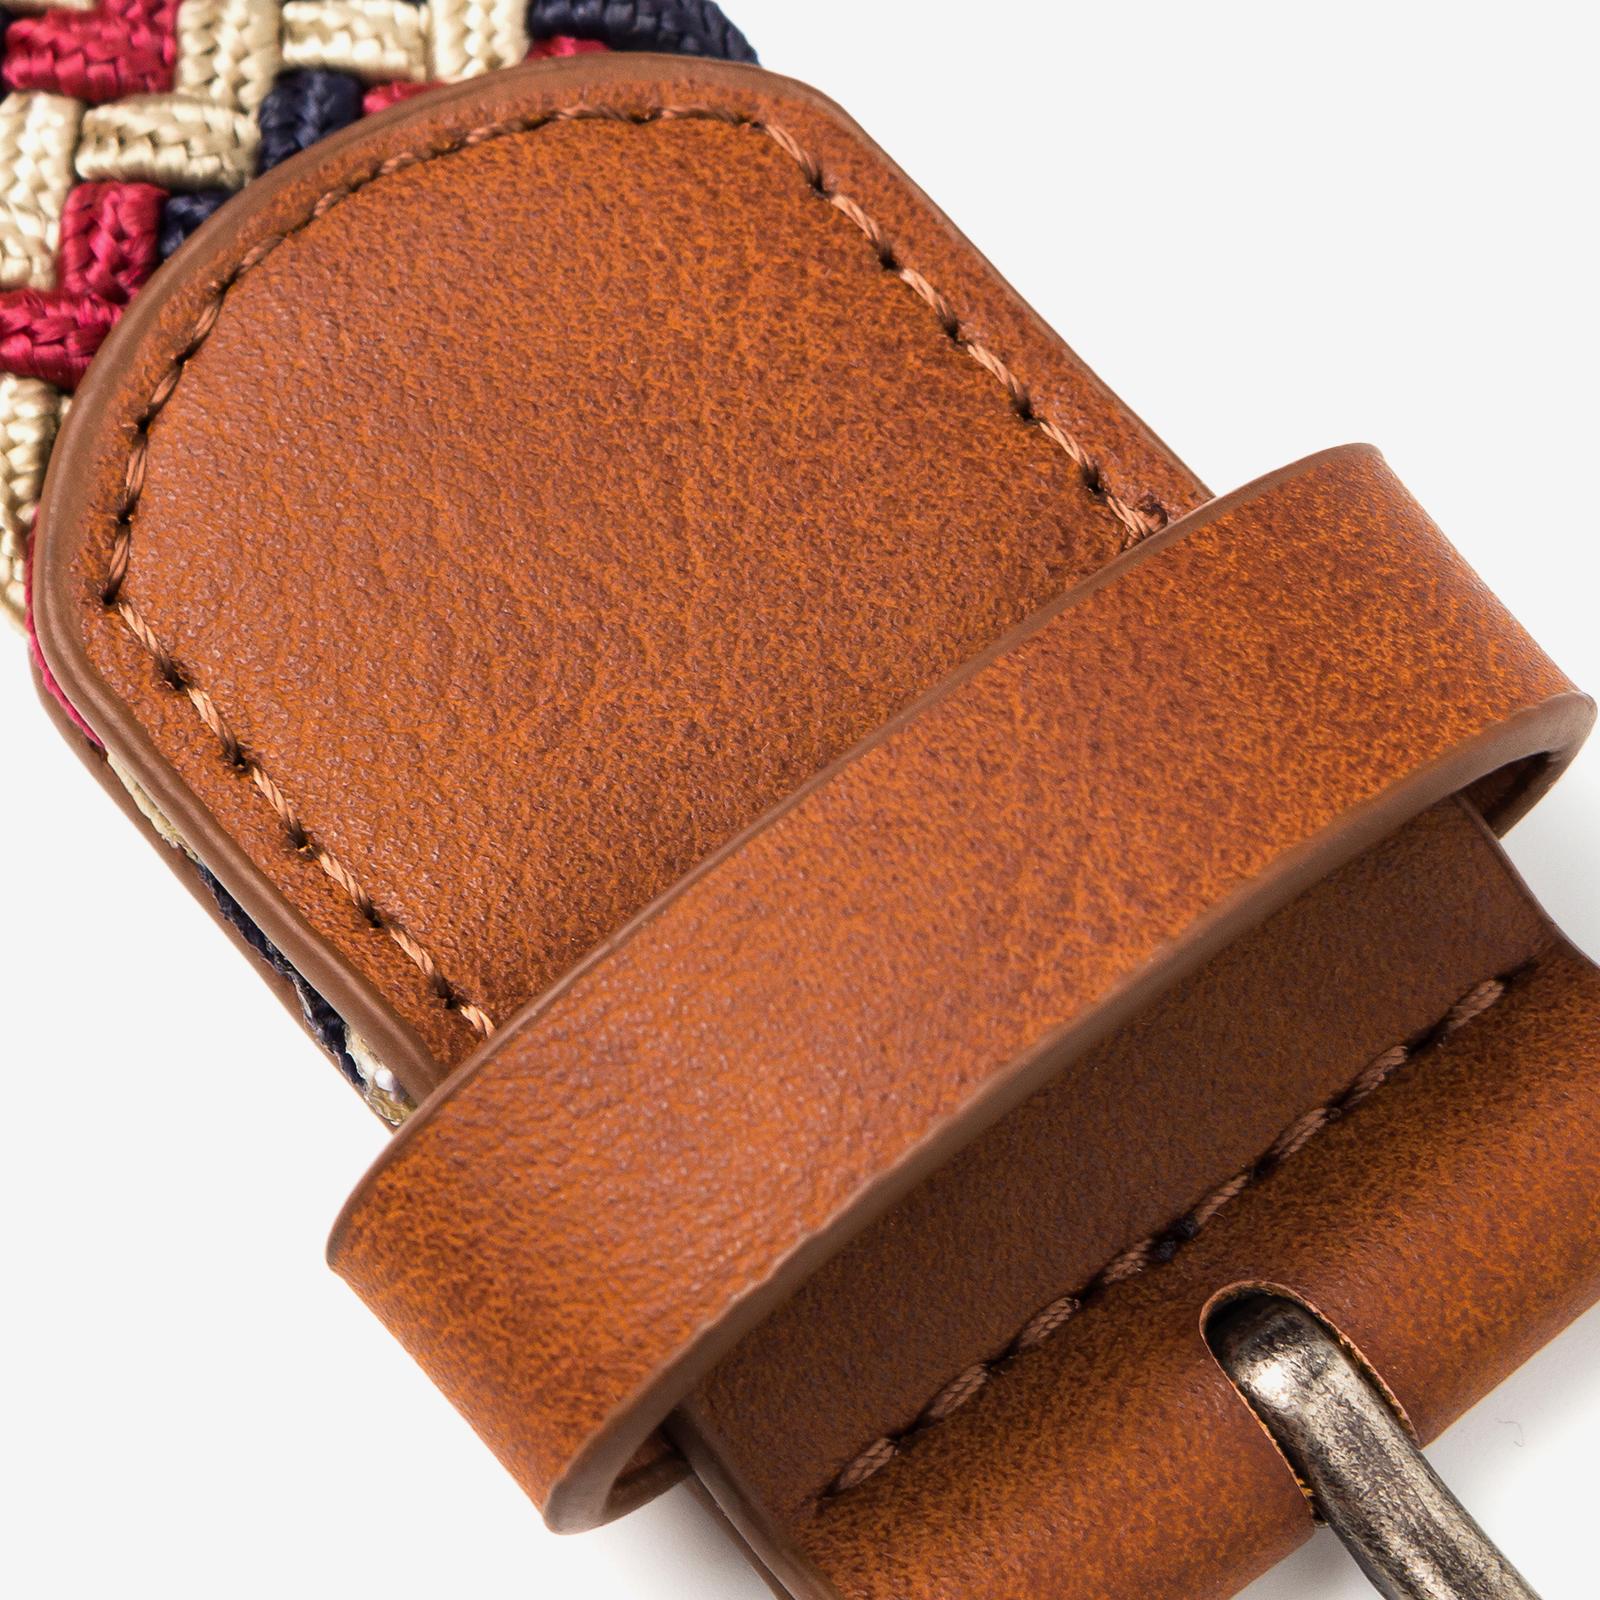 belt product photography